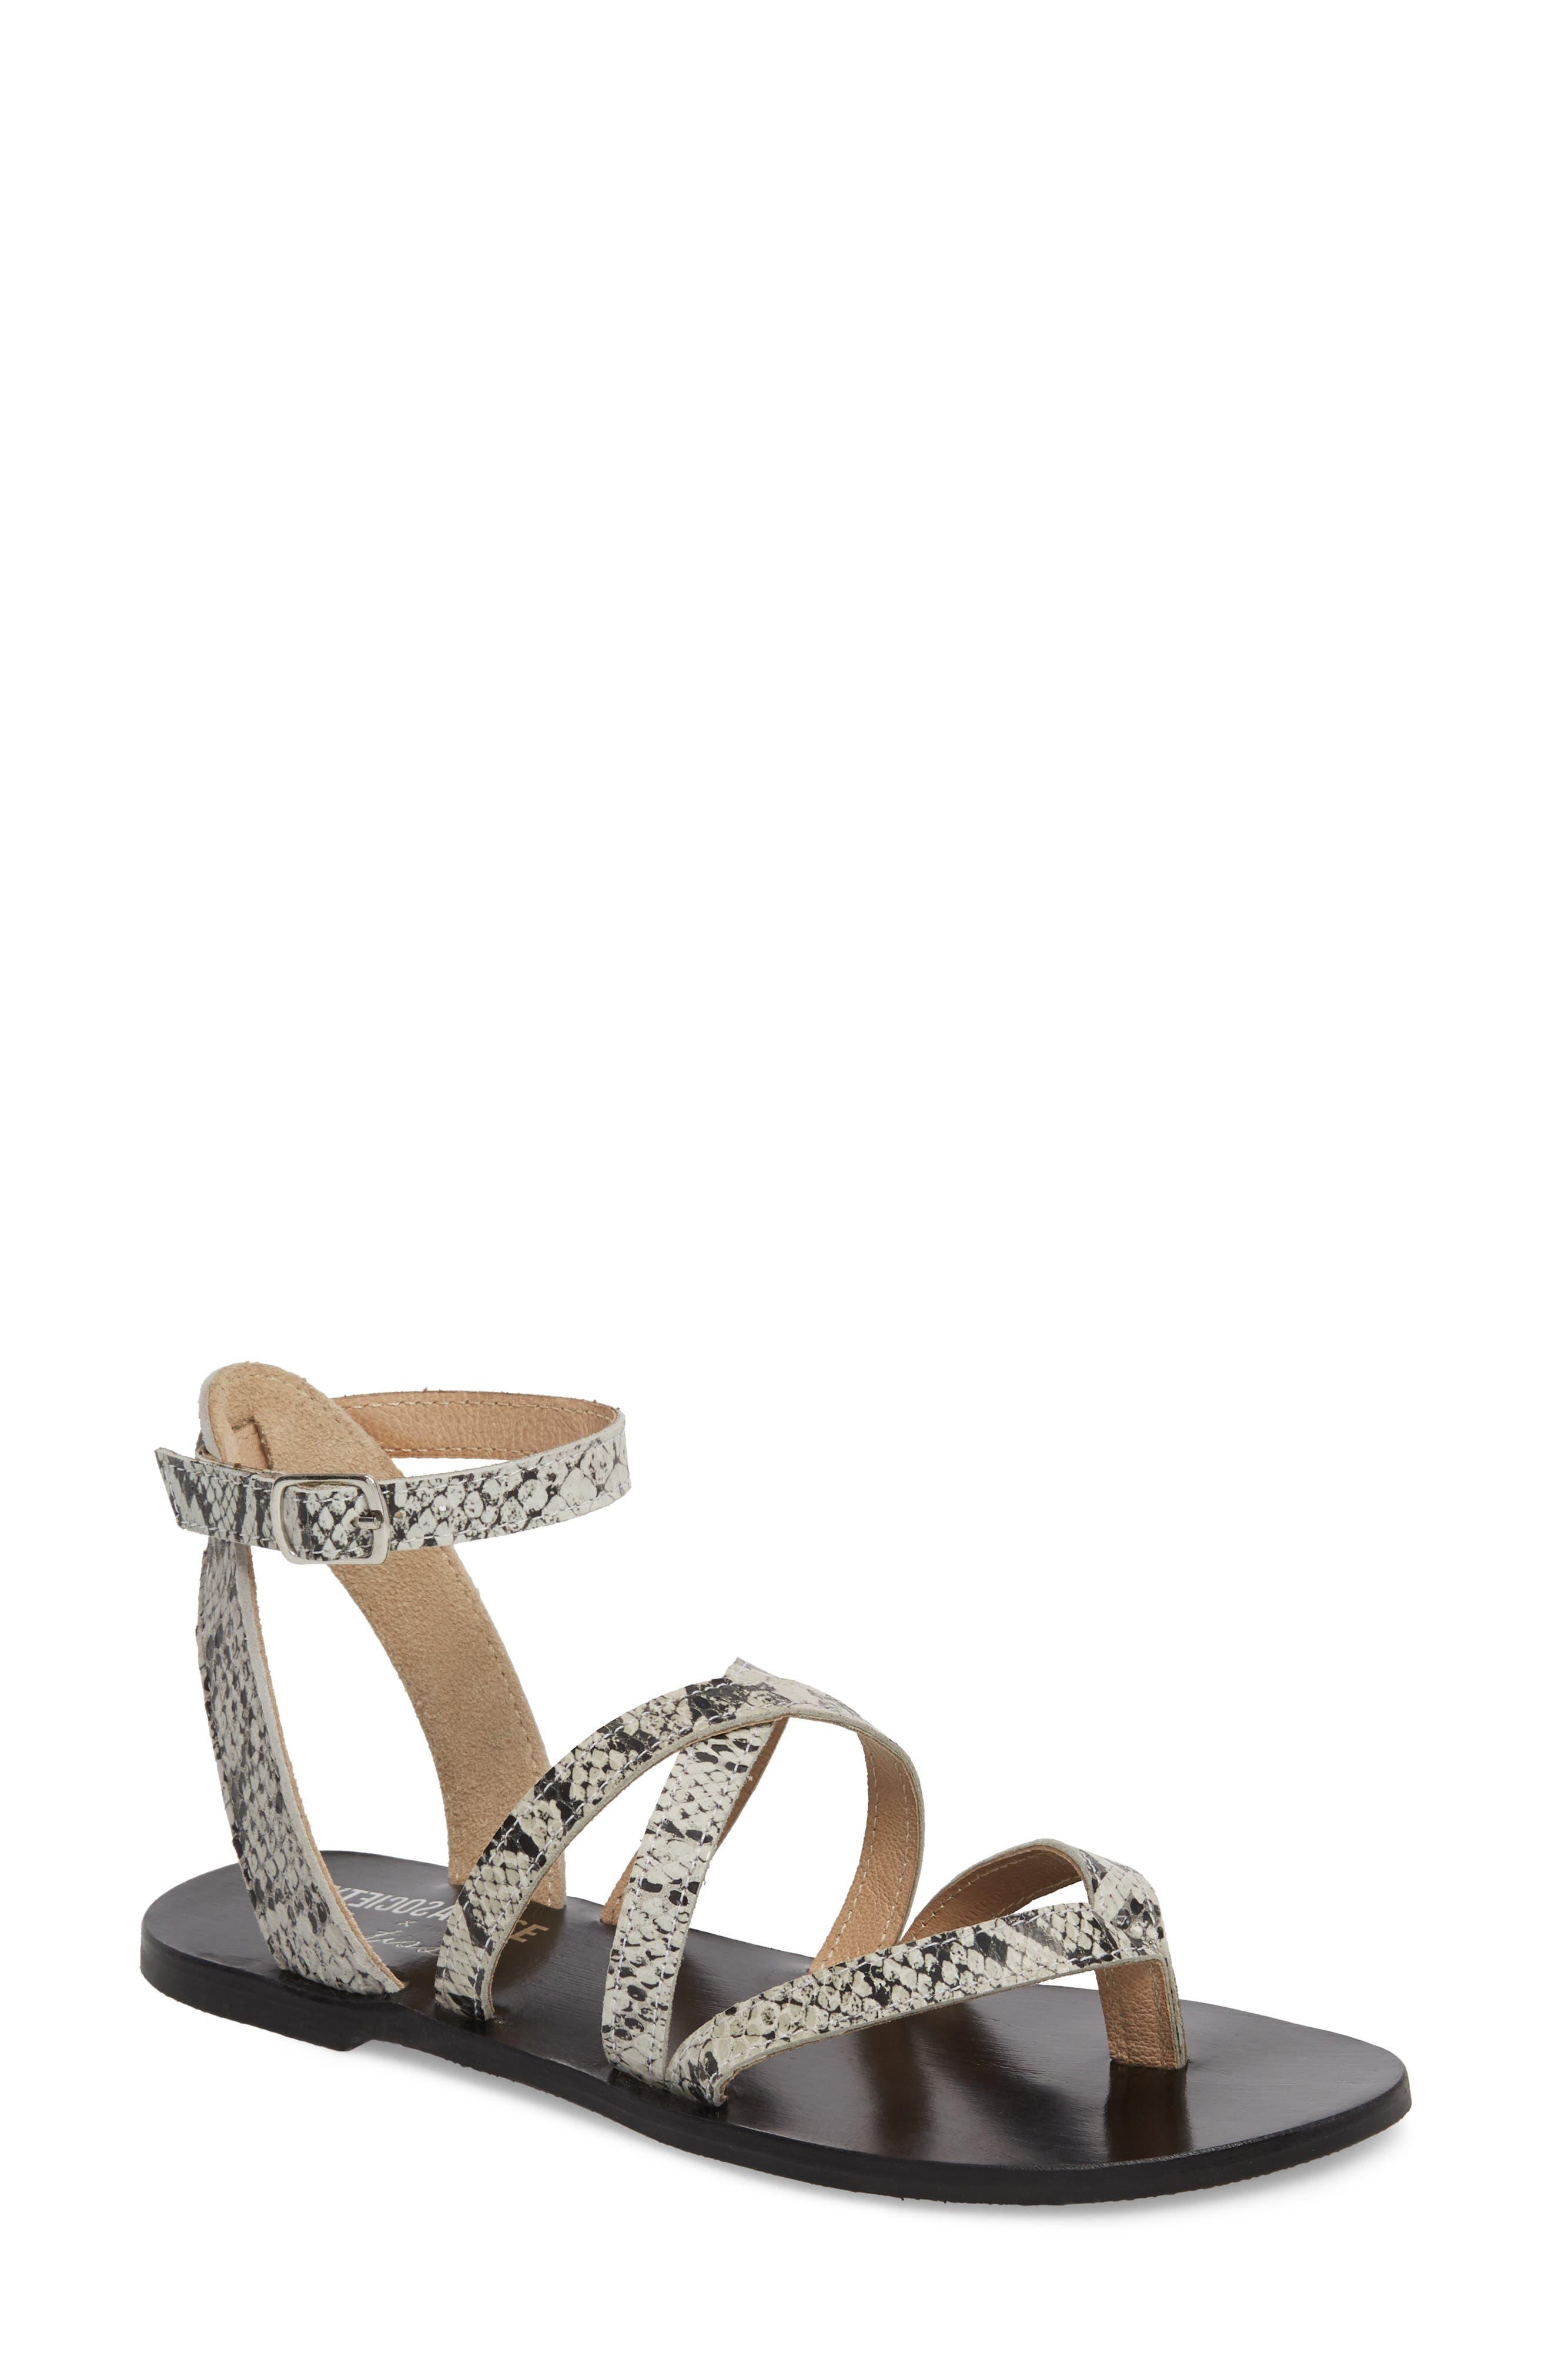 Matisse Strappy Sandal, Black